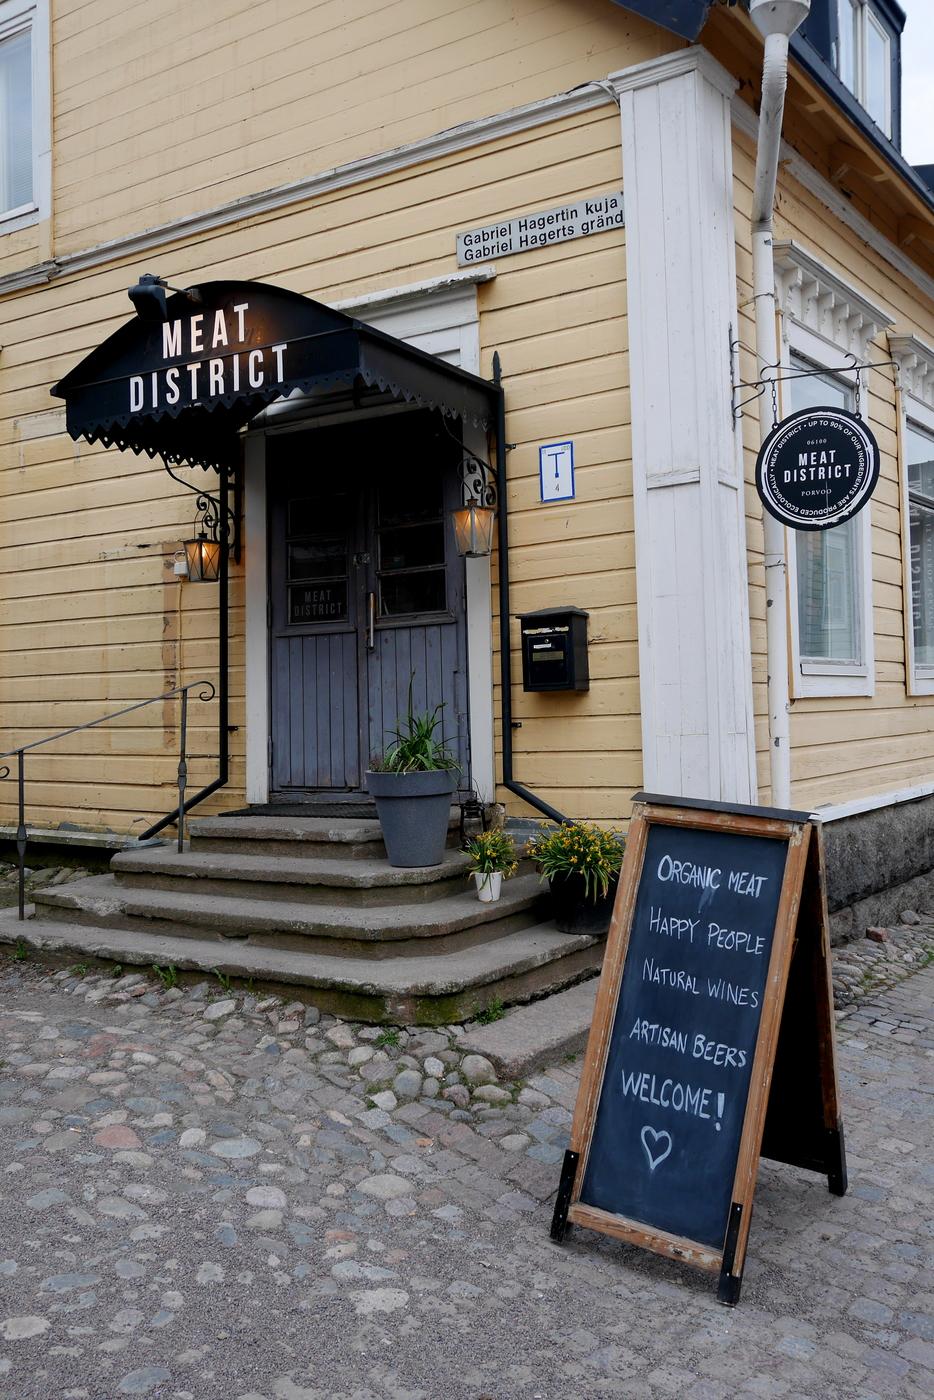 Ravintola Meat District, Porvoo.